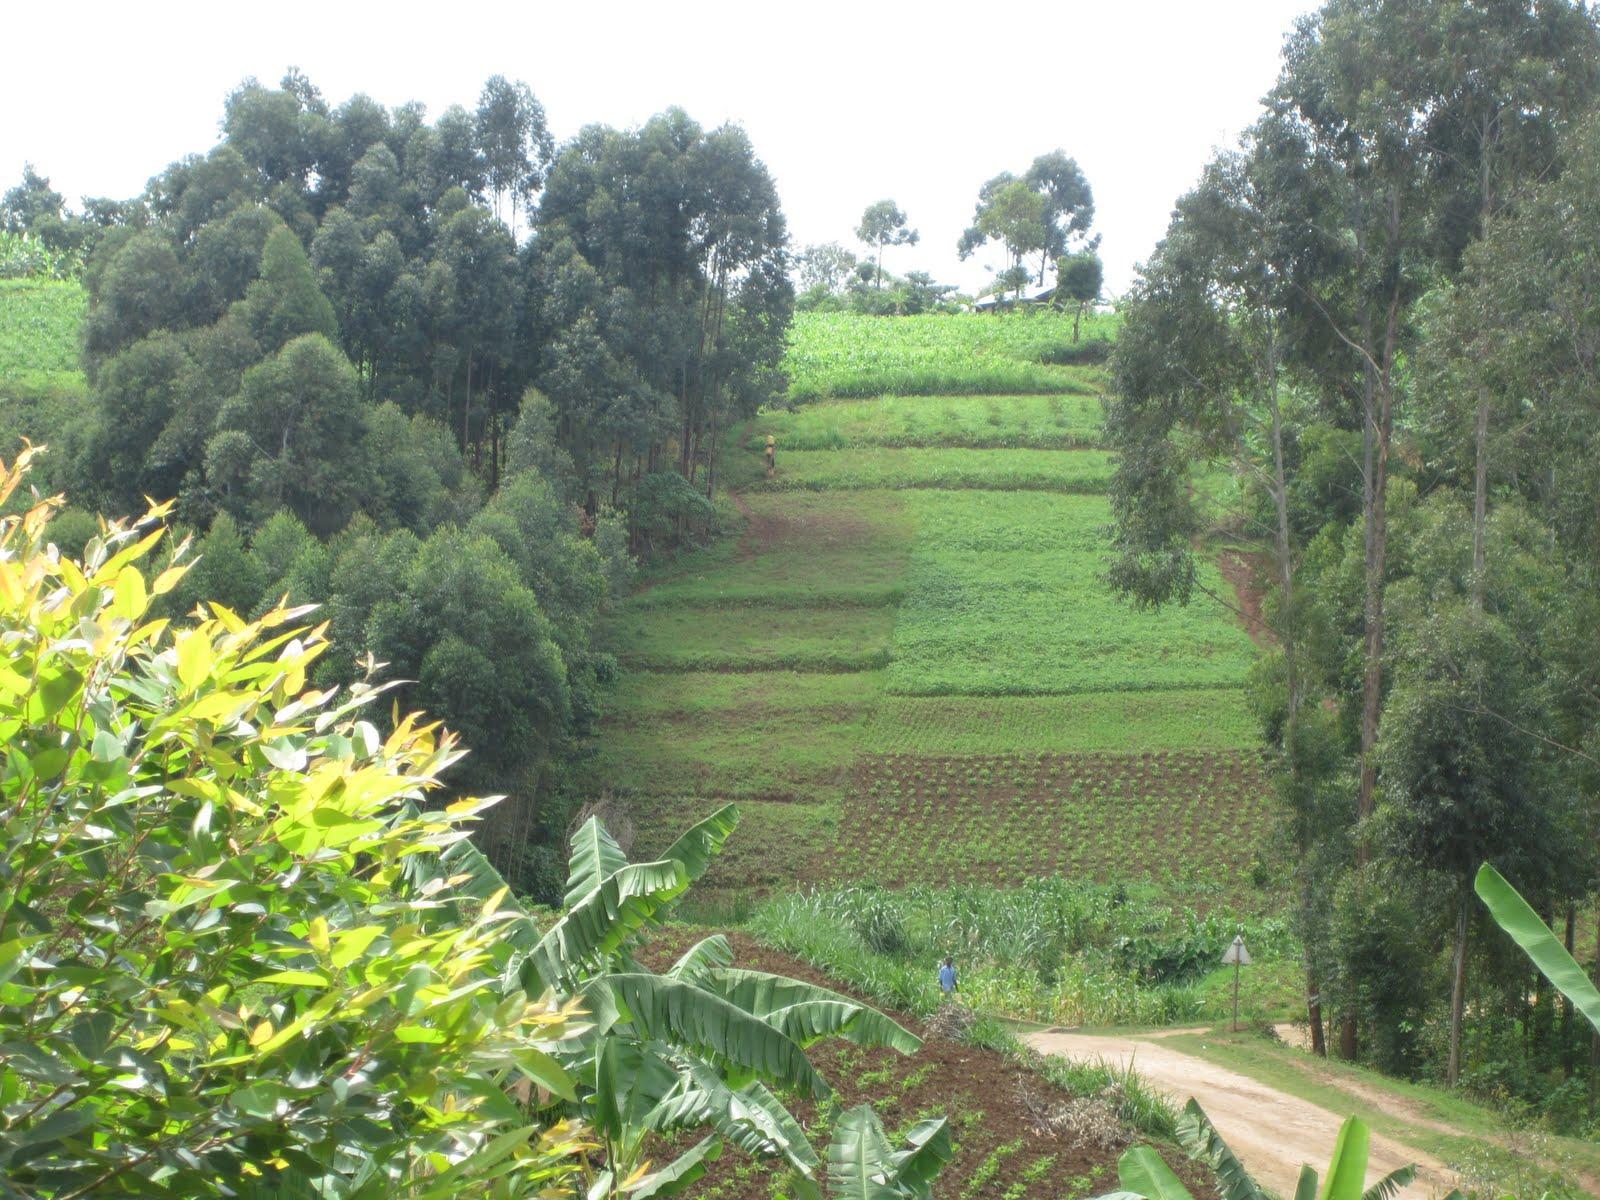 The Barlows in Uganda: Mbale, the Garden of Eden of Uganda